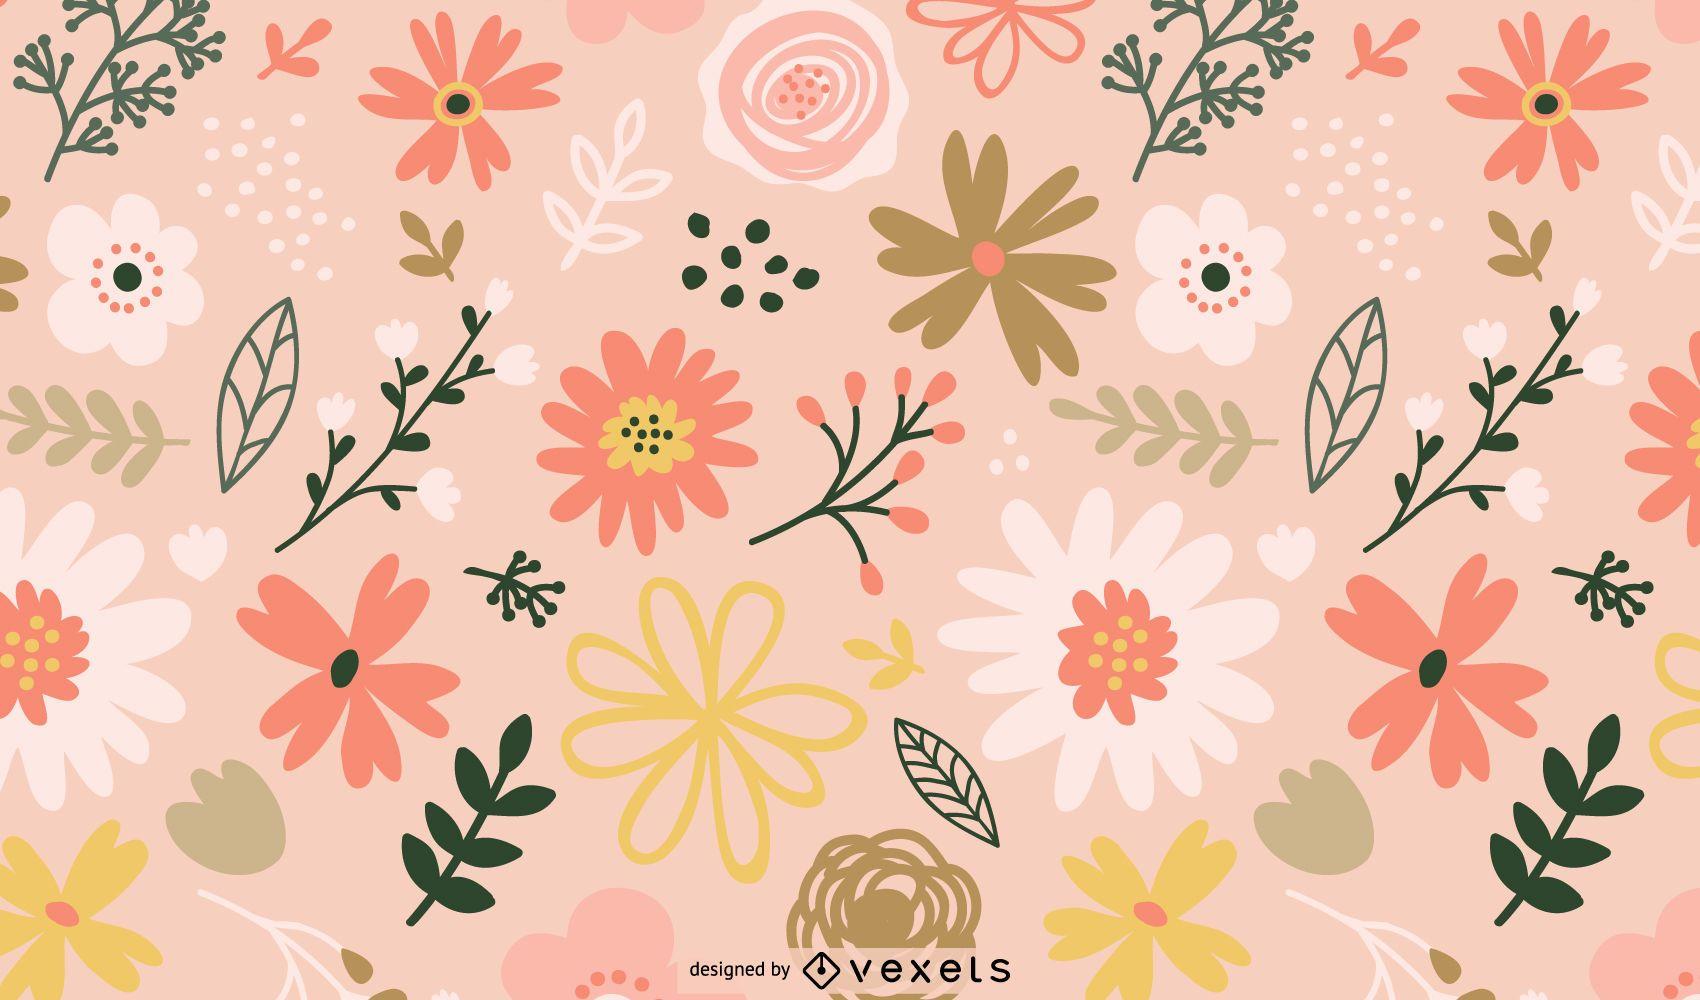 Spring flowers pattern design